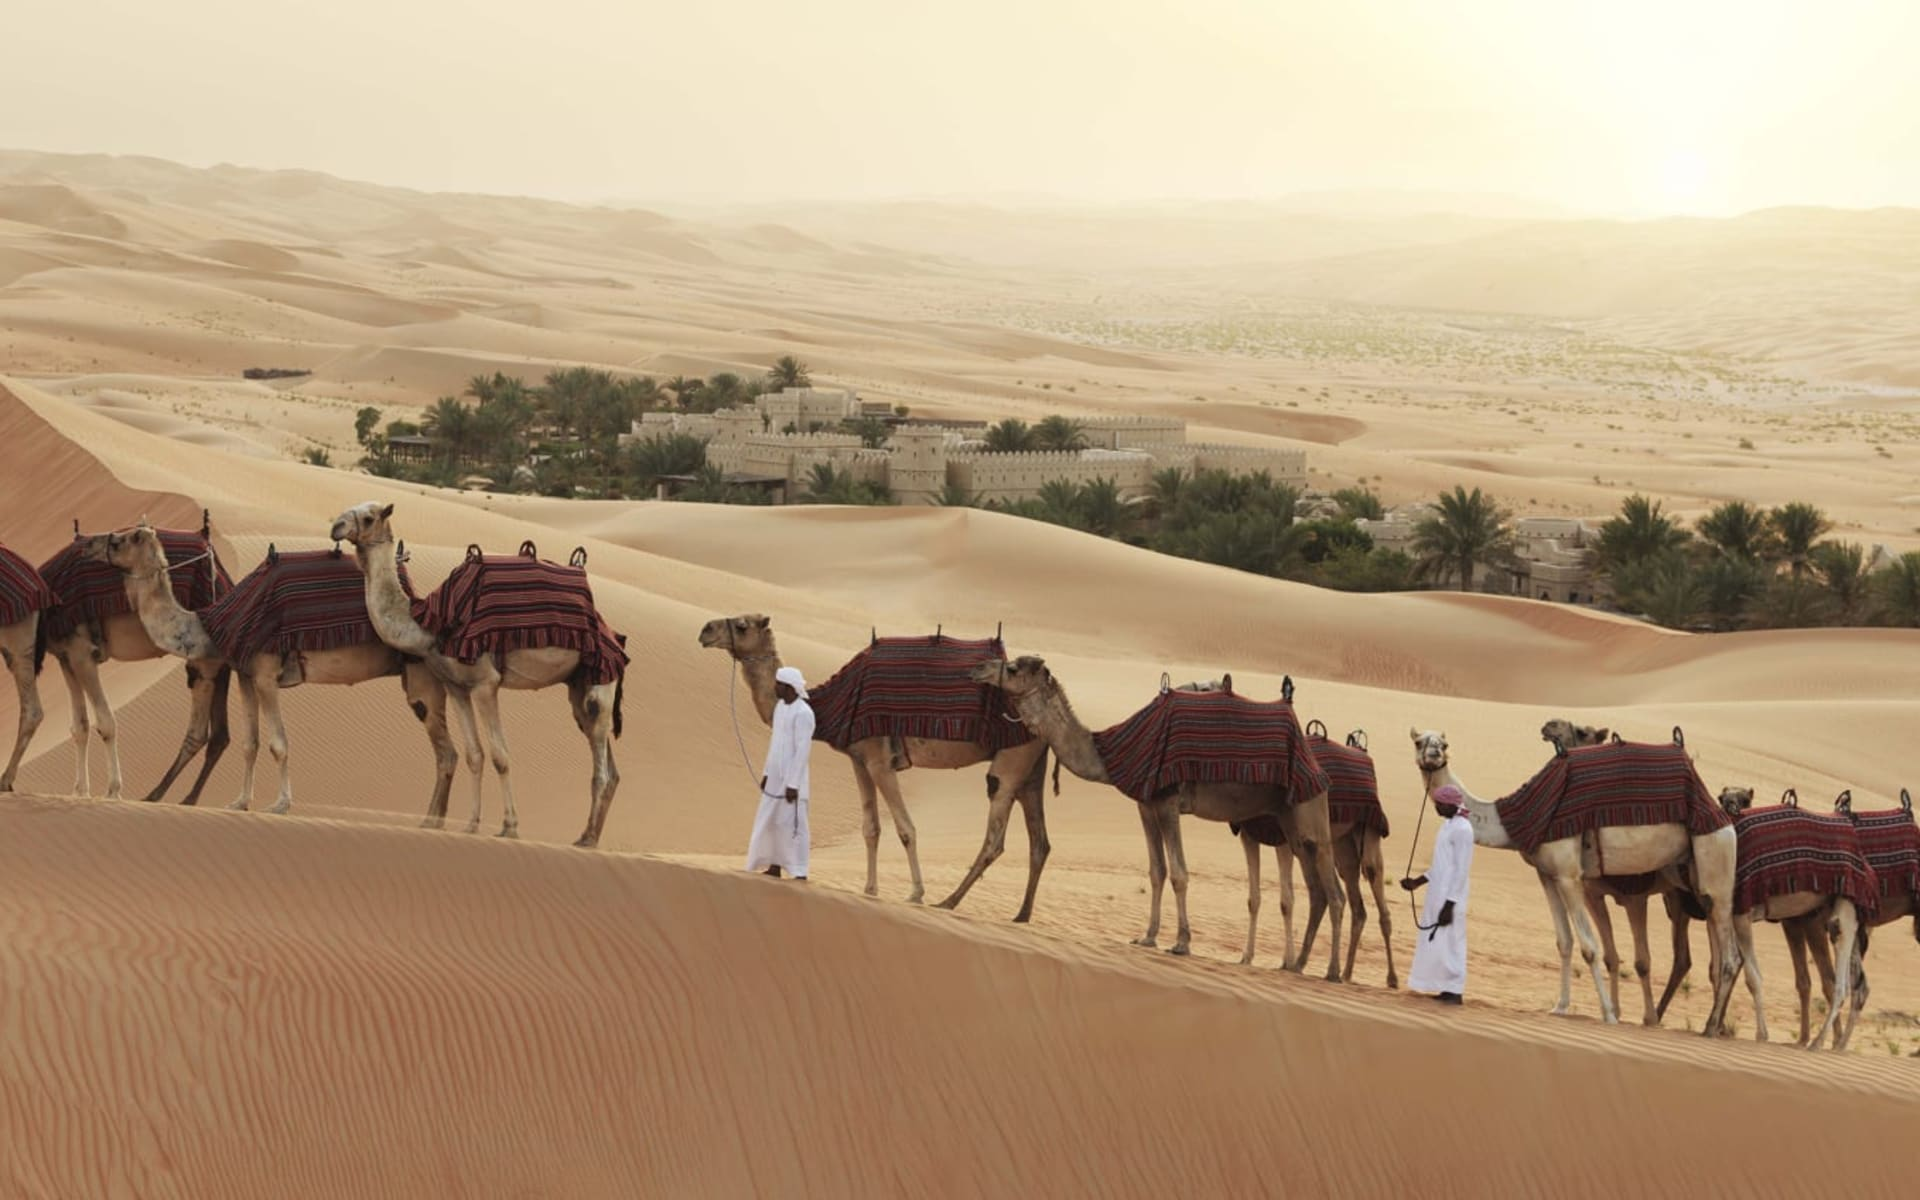 Anantara Qasr Al Sarab Desert Resort in Liwa: Camel